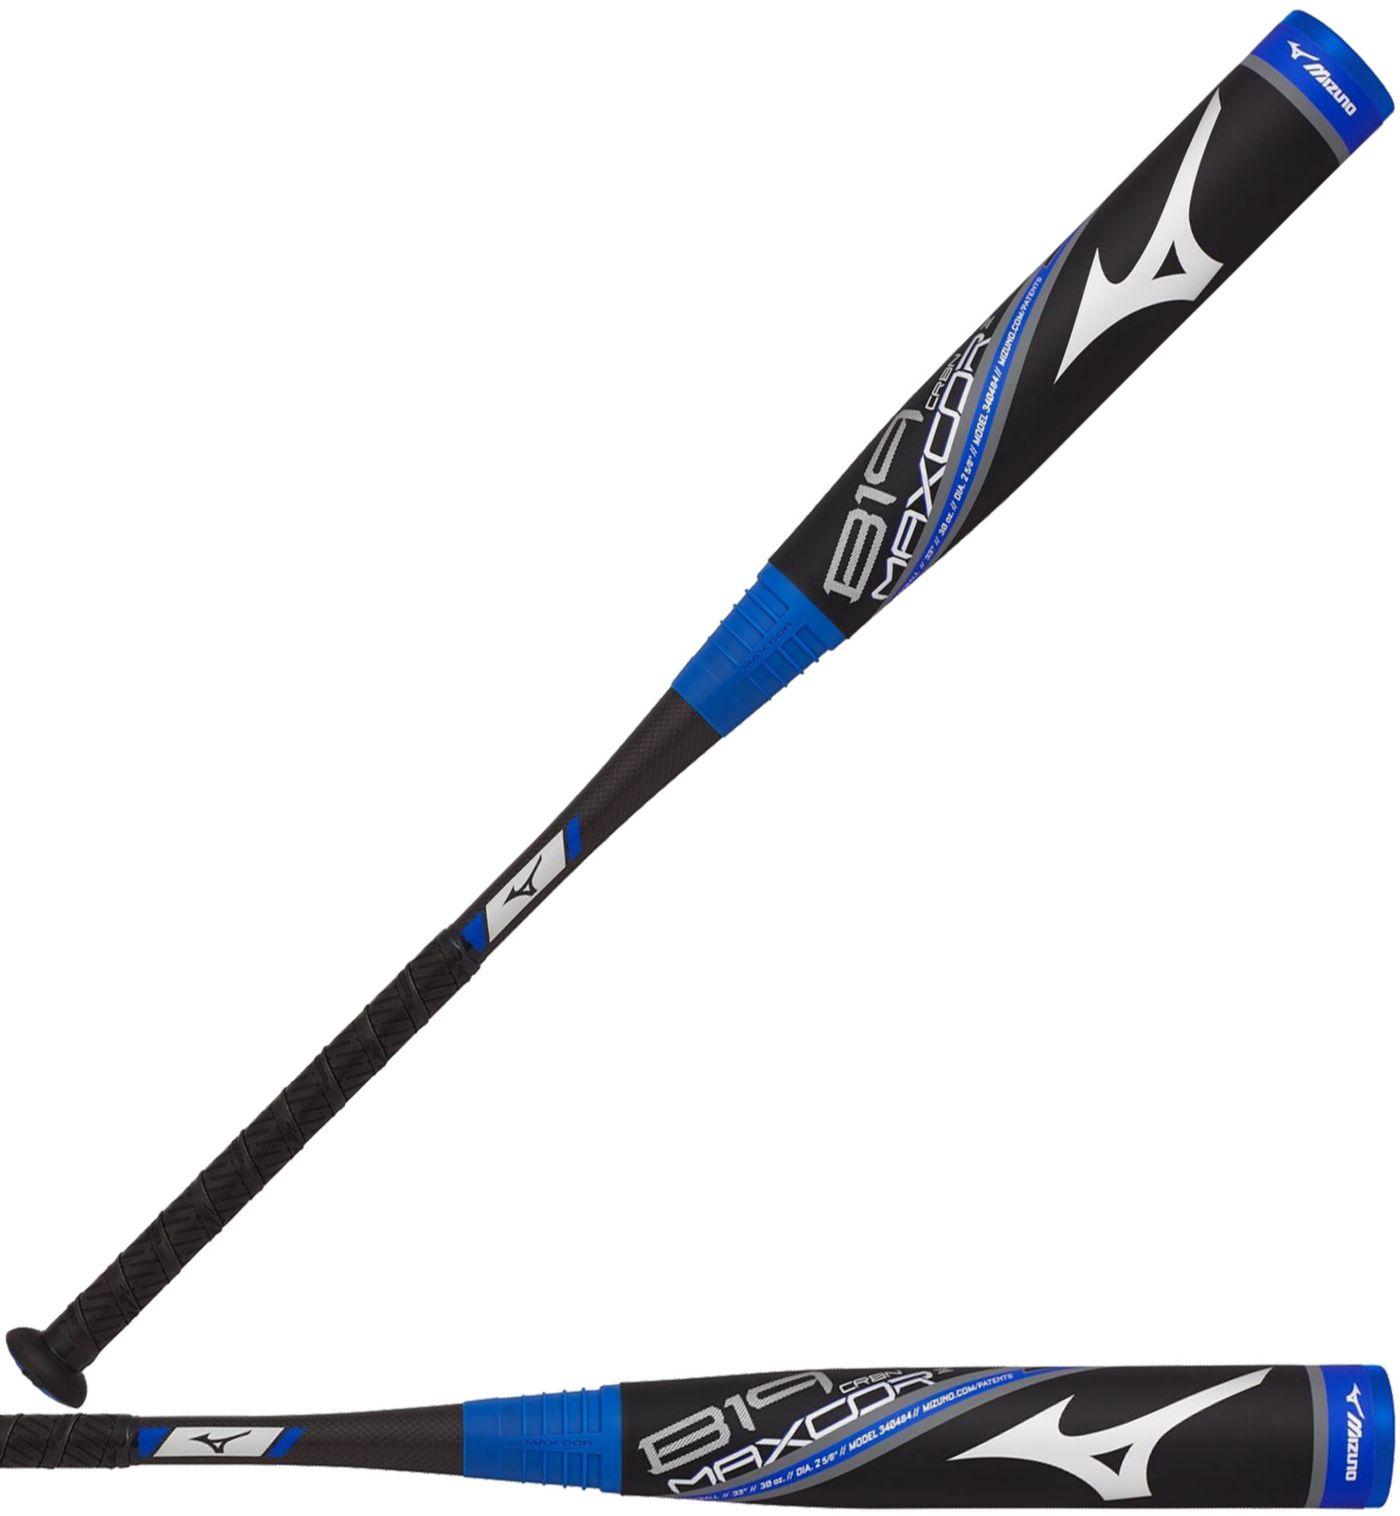 Mizuno B19 MAXCOR Carbon USA Youth Bat 2019 (-5)